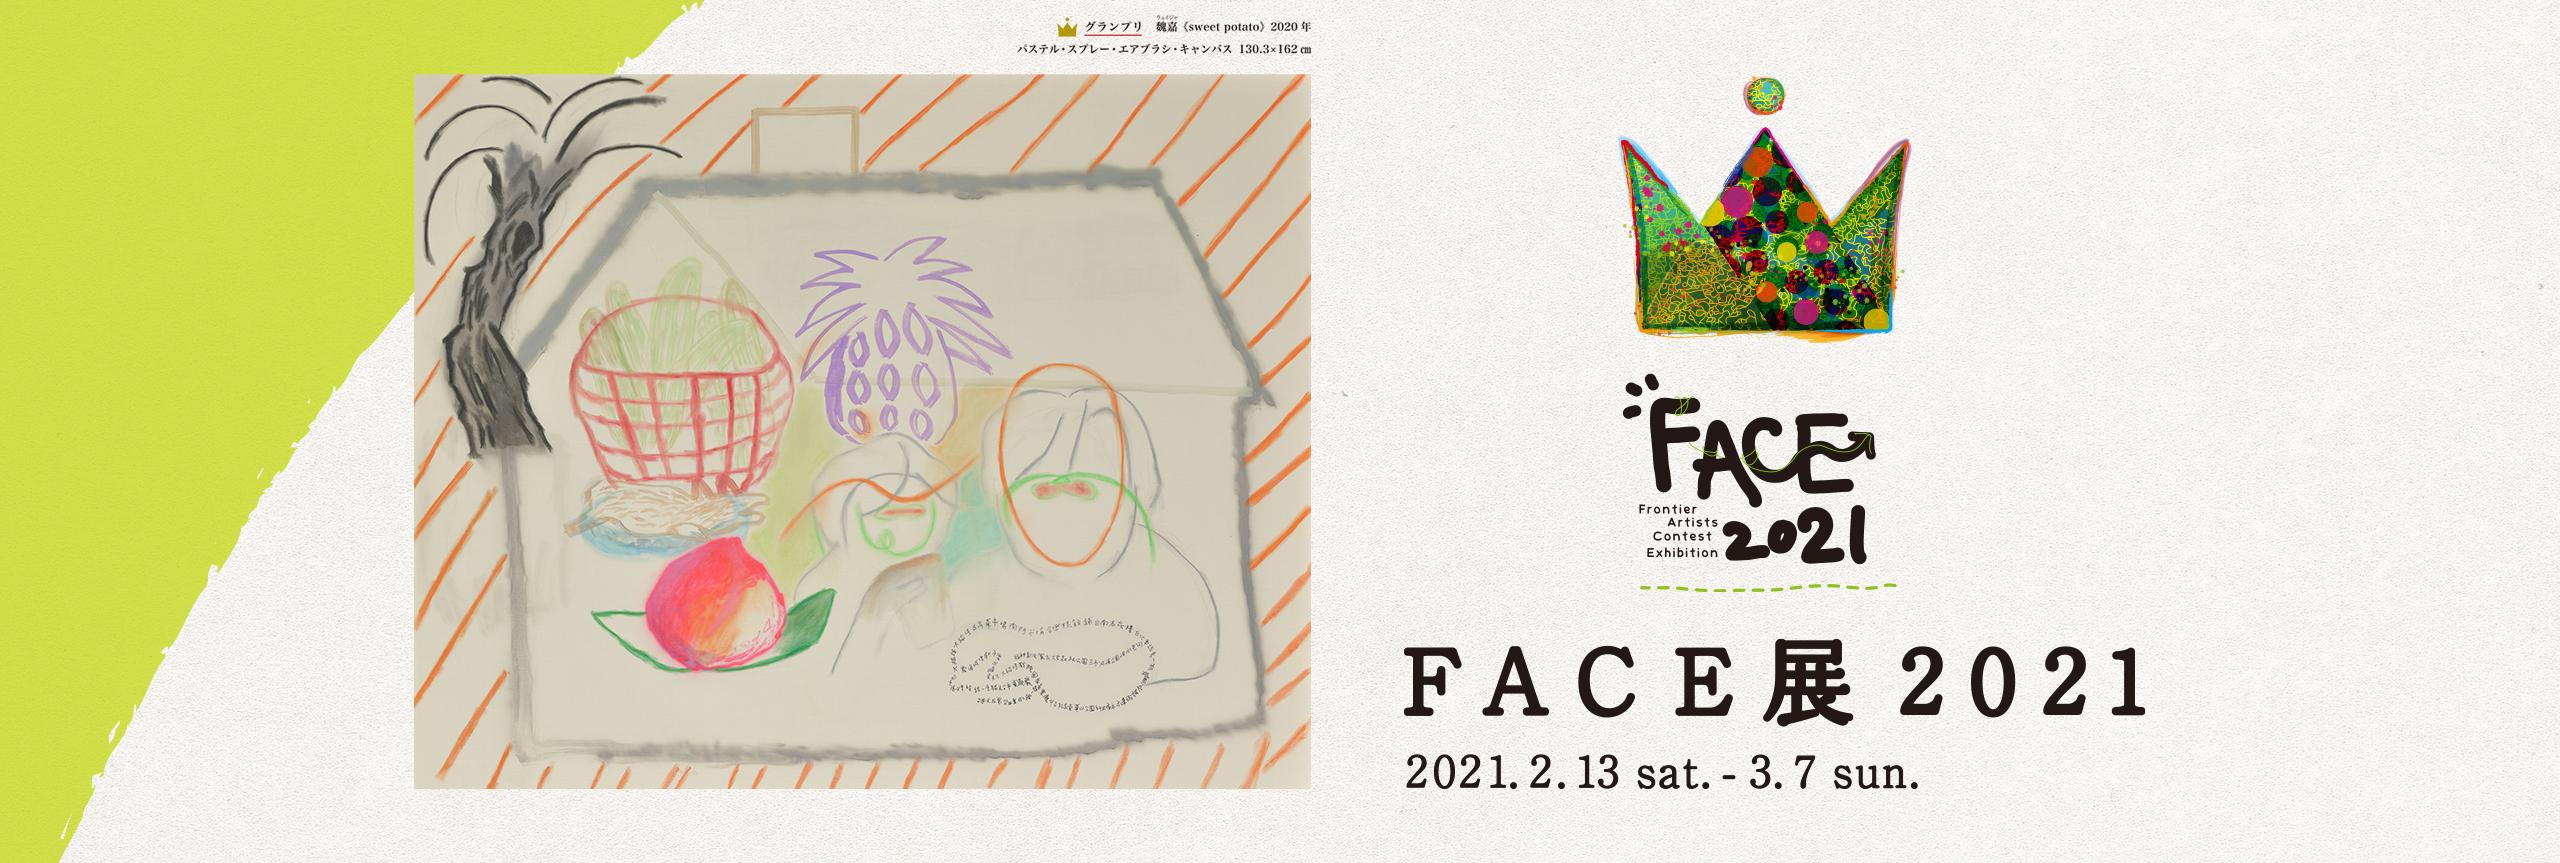 FACE 2021